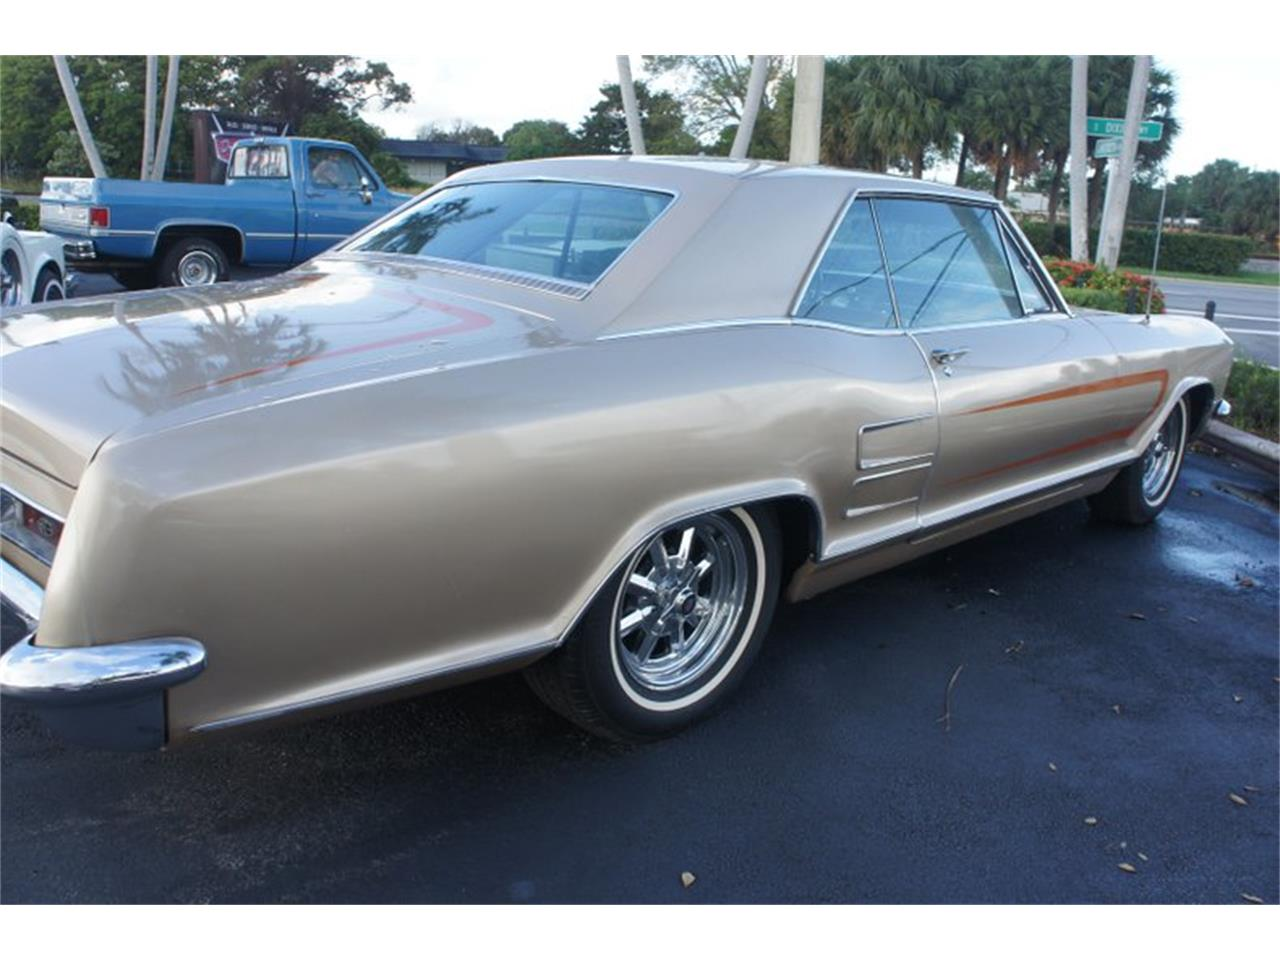 1964 Buick Riviera (CC-1422132) for sale in Lantana, Florida